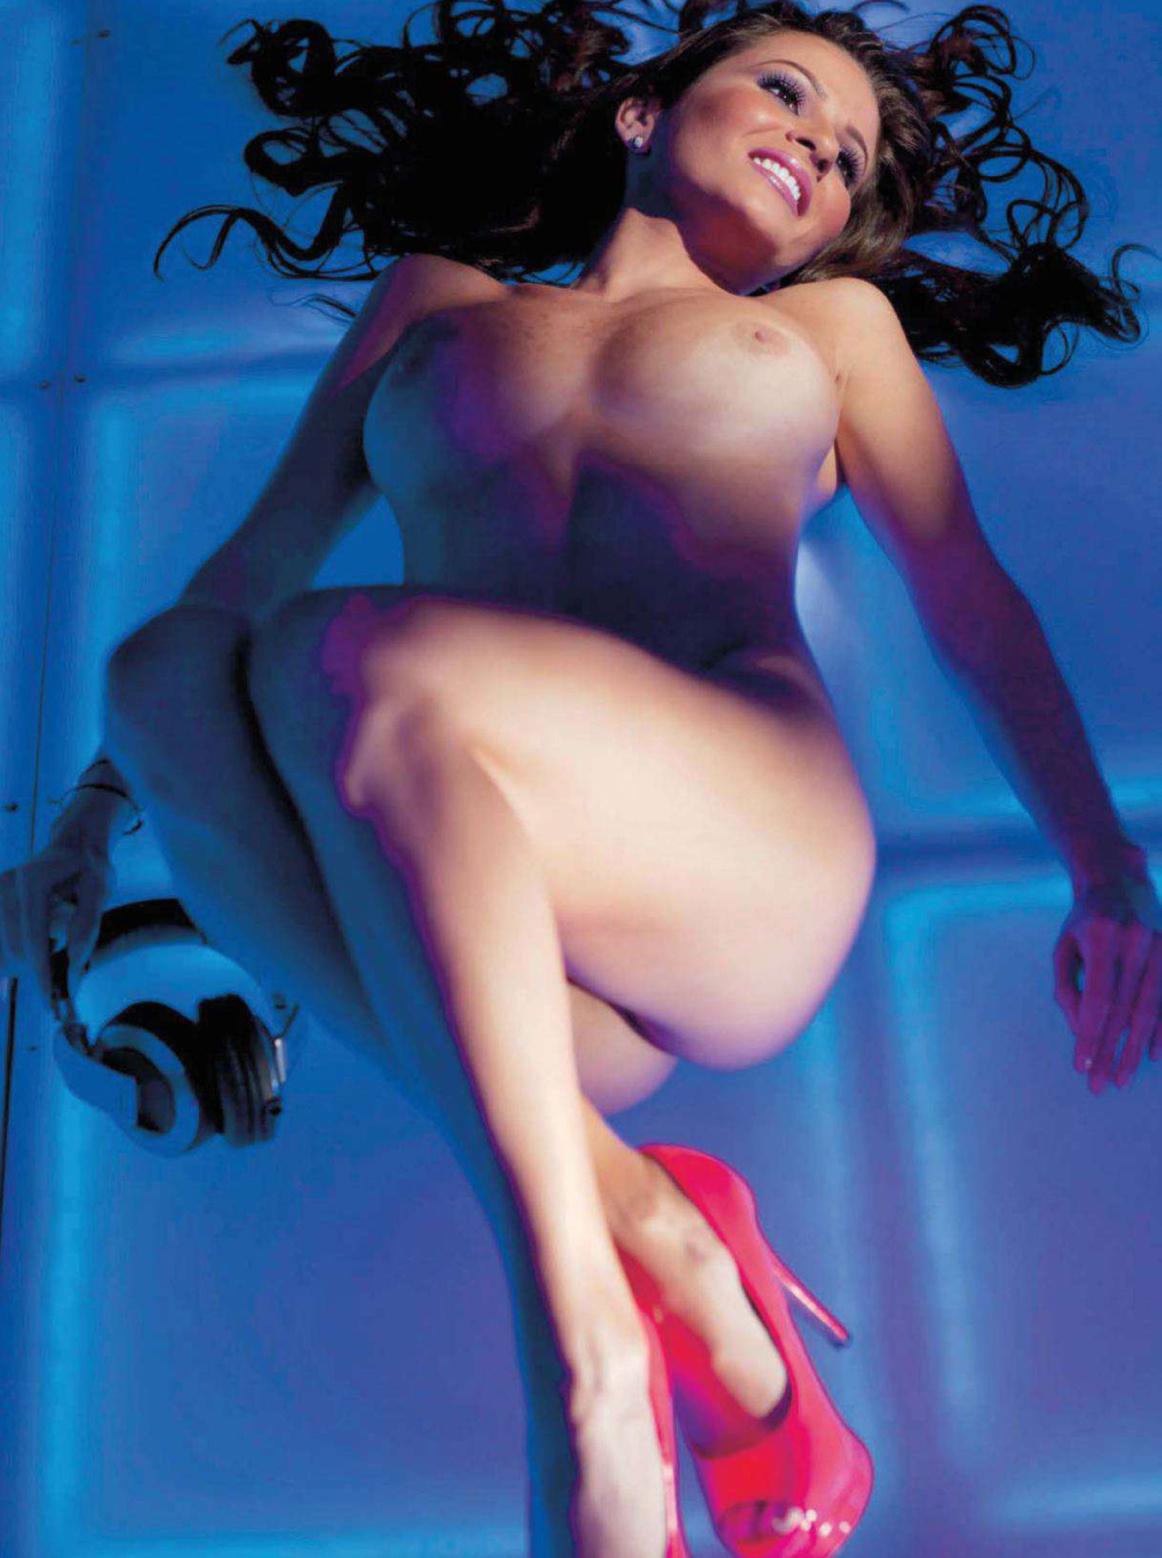 36701_septimiu29_DJAgniezka_PlayboyVenezuela_Sept201211_123_439lo.jpg